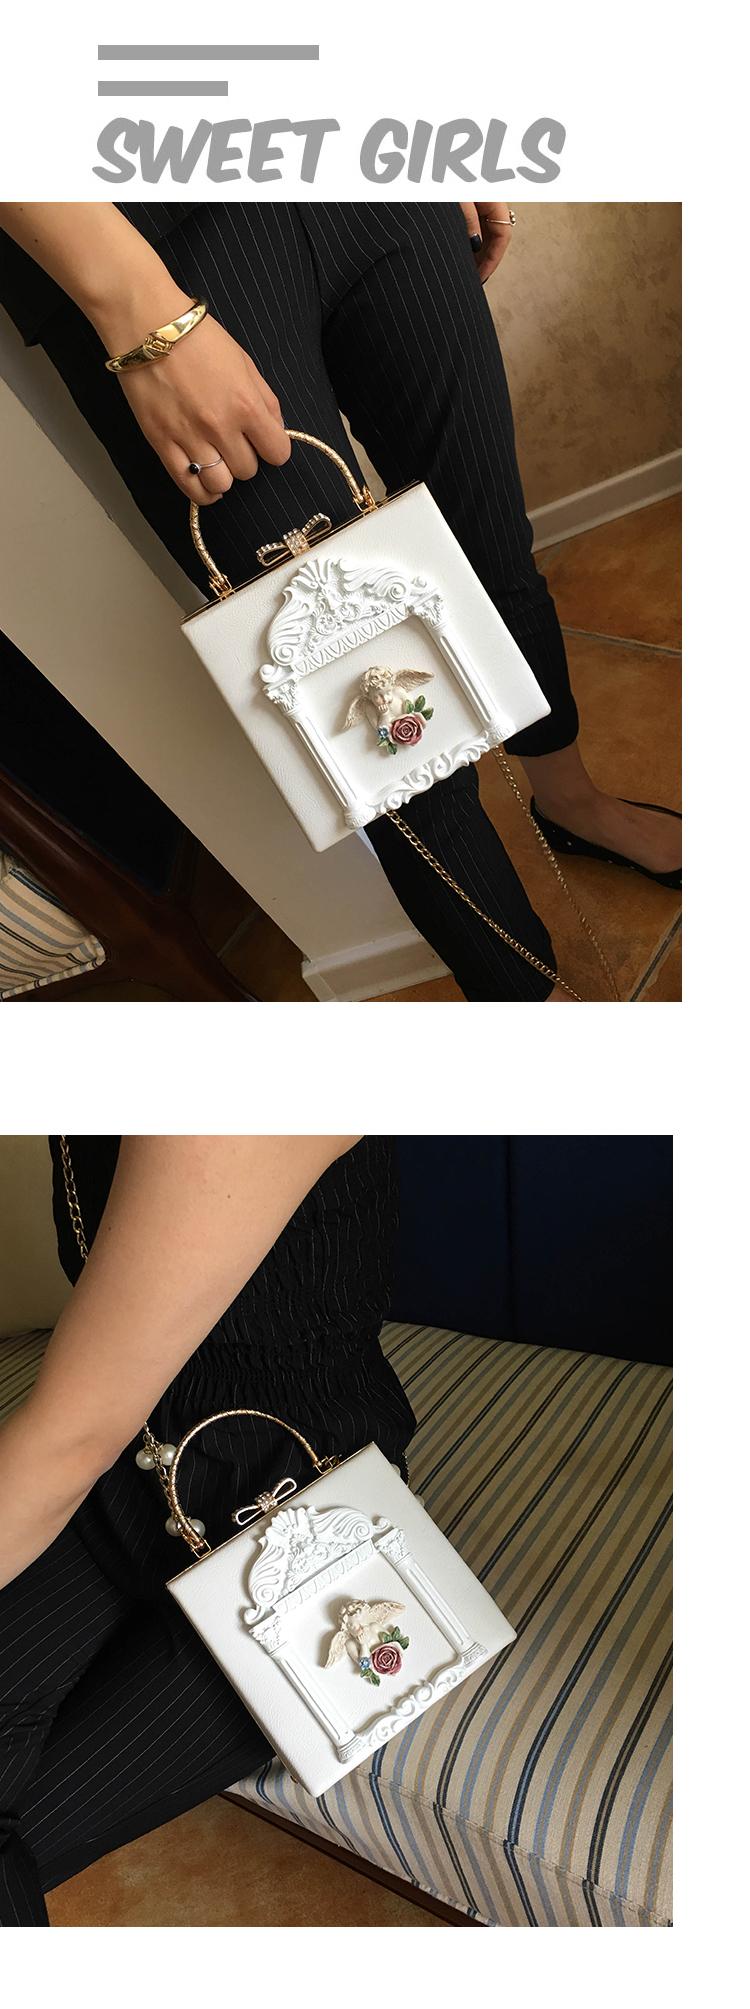 2018 NEW Rose 3D Palace Sculpture Frame Bag Luxury Handbags Women Party Bags Designer Lady Cute Shoulder Messenger Bag Sac Tote 24